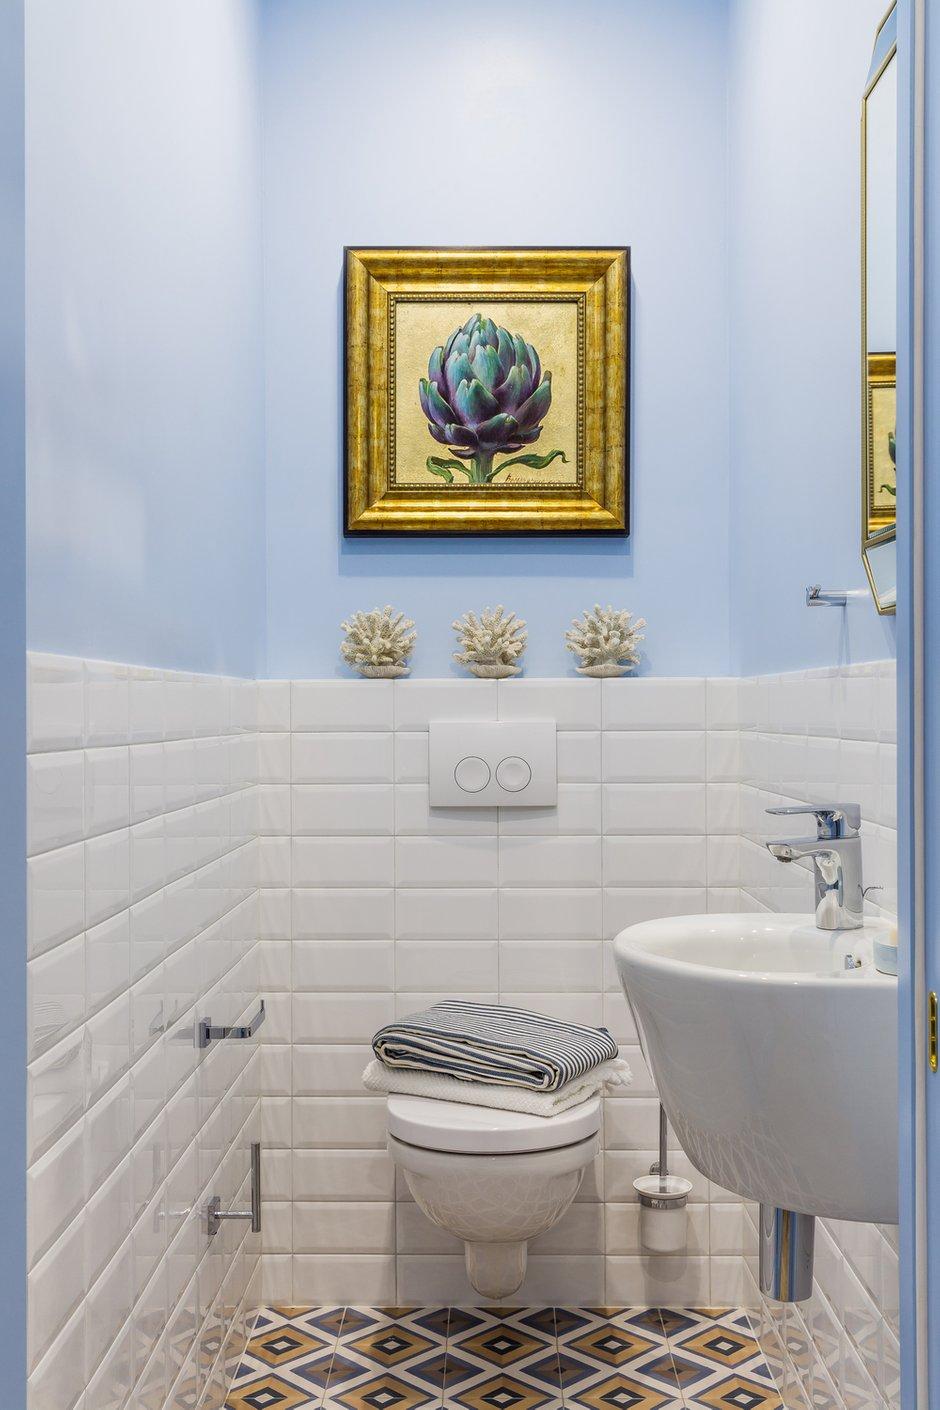 Фотография: Ванная в стиле Современный, Эклектика, Квартира, Проект недели, Бежевый, Желтый, Голубой, 3 комнаты, 60-90 метров, Анна Акопян, Анапа – фото на INMYROOM